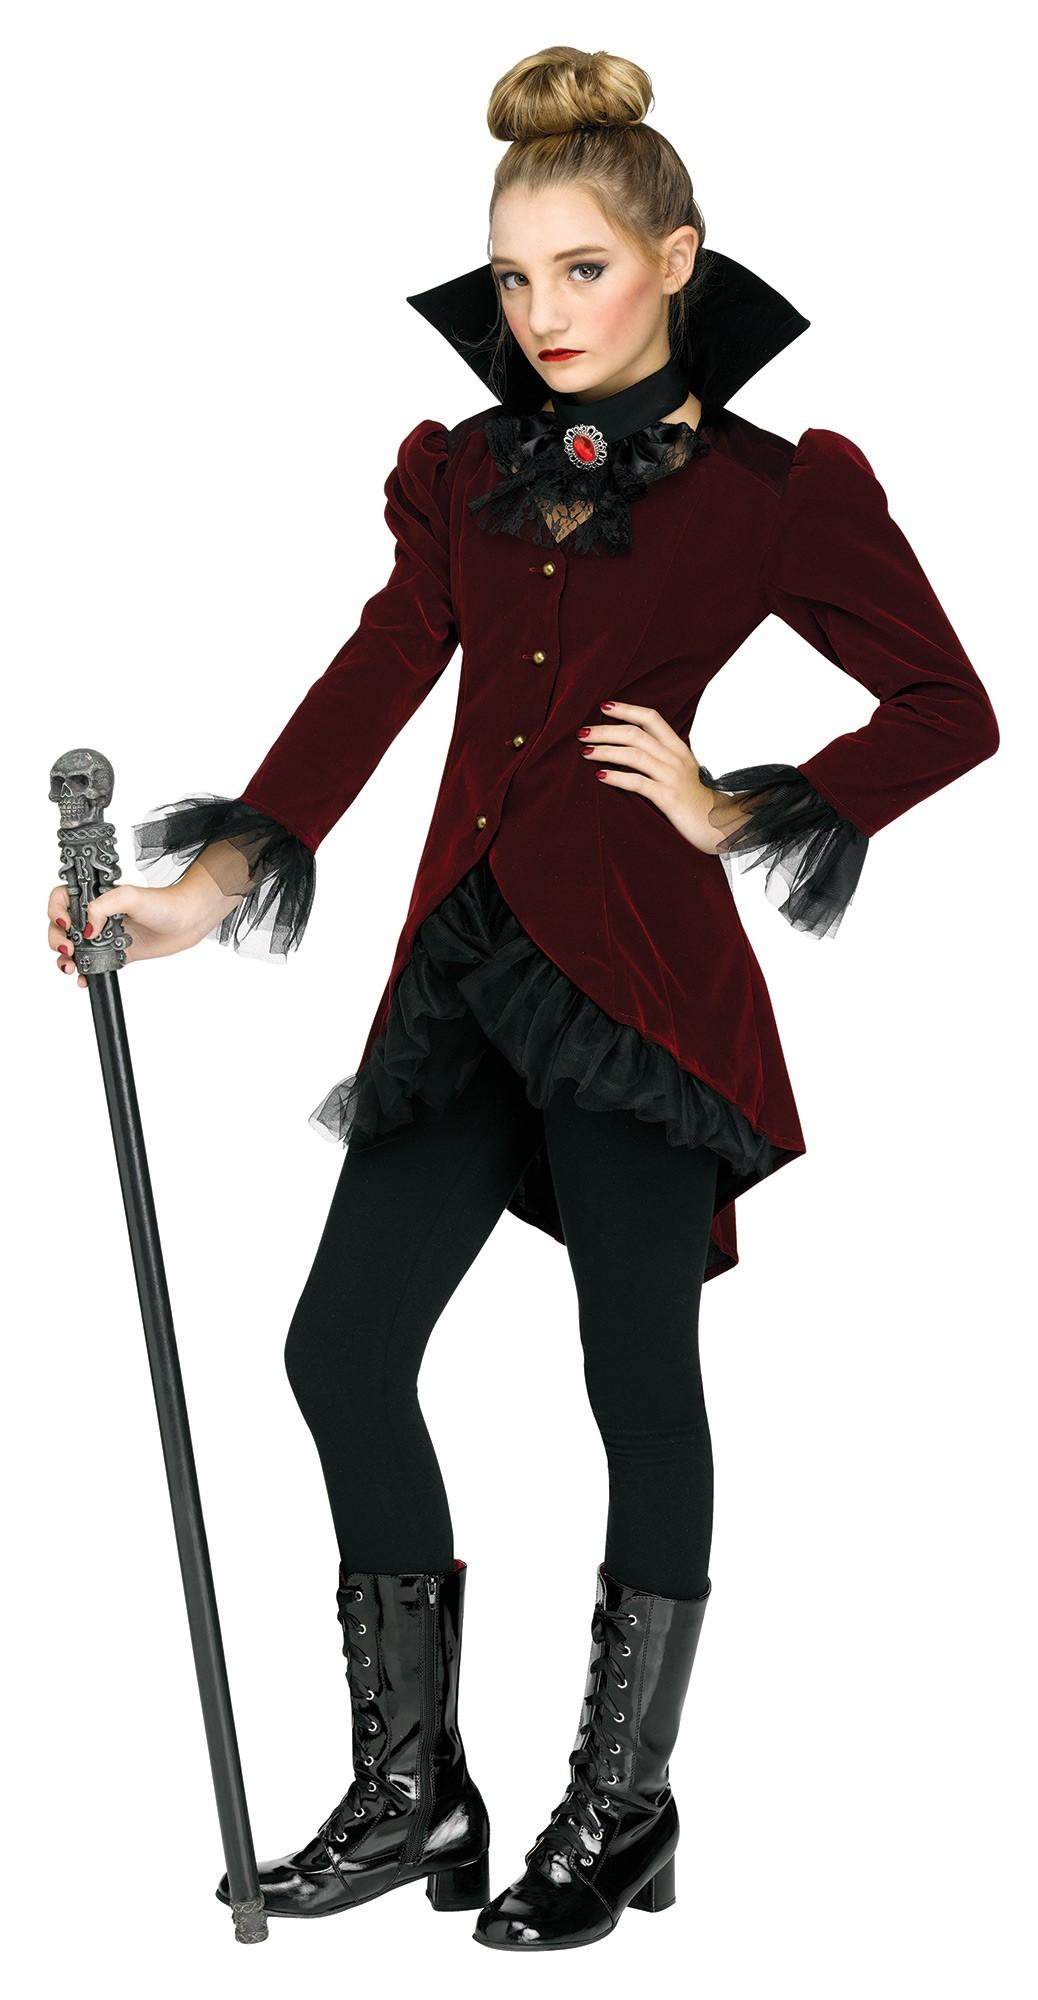 vampire dolly halloween costume girls tween deep burgundy red coat n jabot